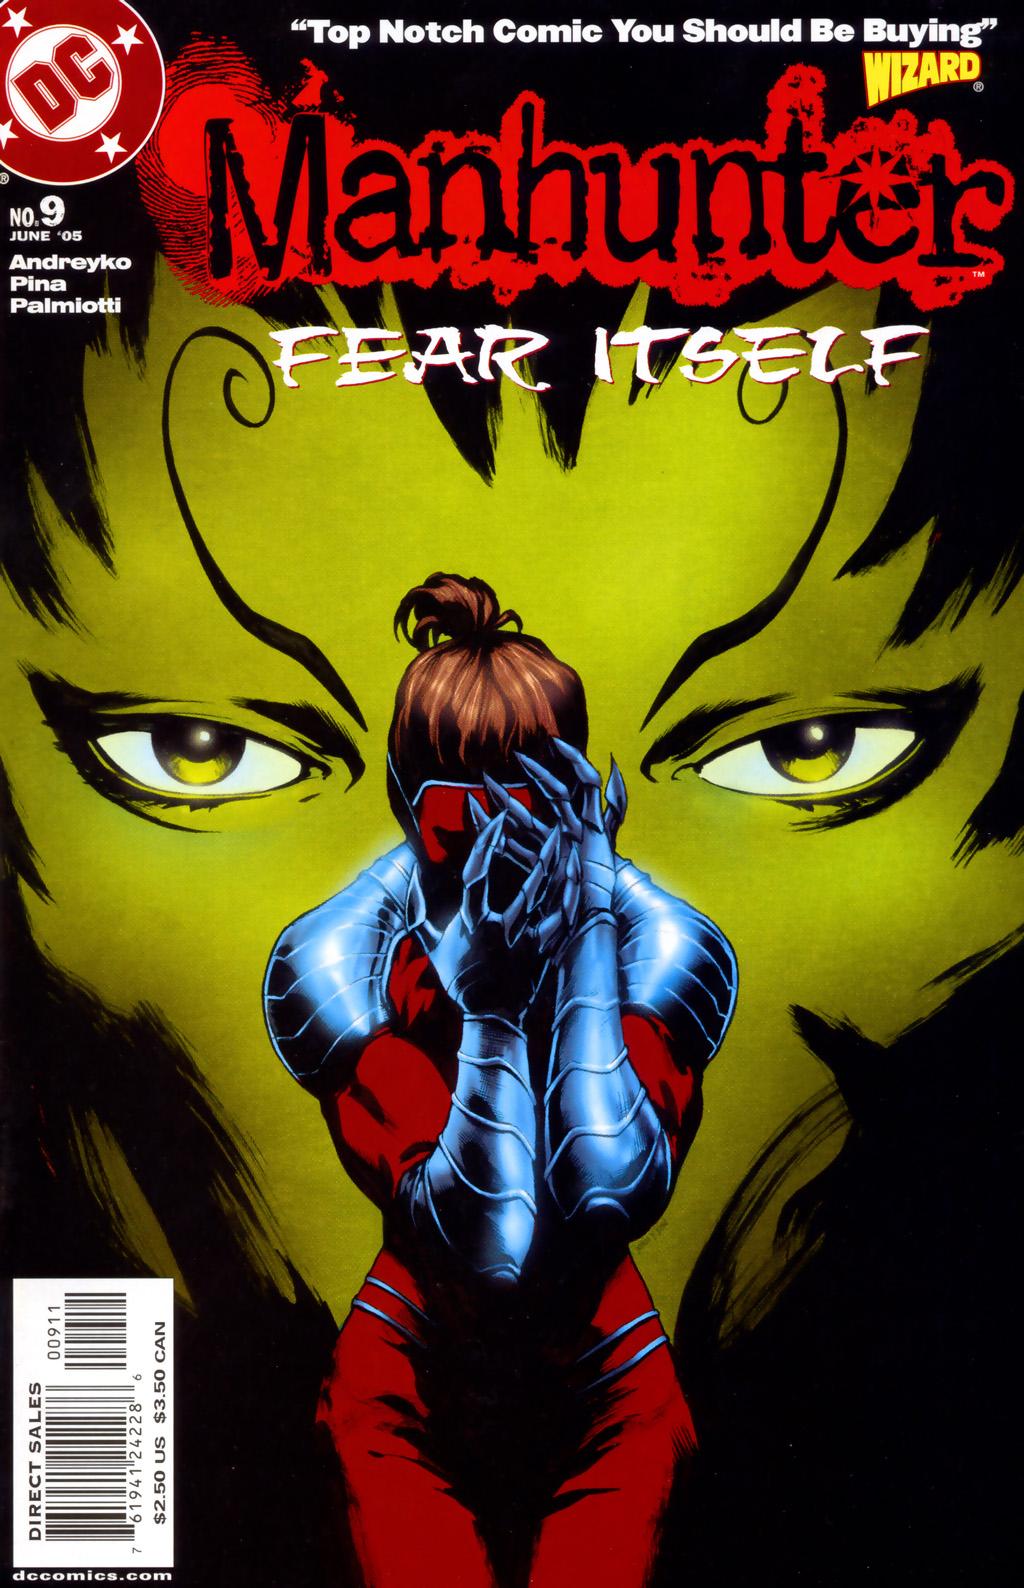 Manhunter (2004) issue 9 - Page 1